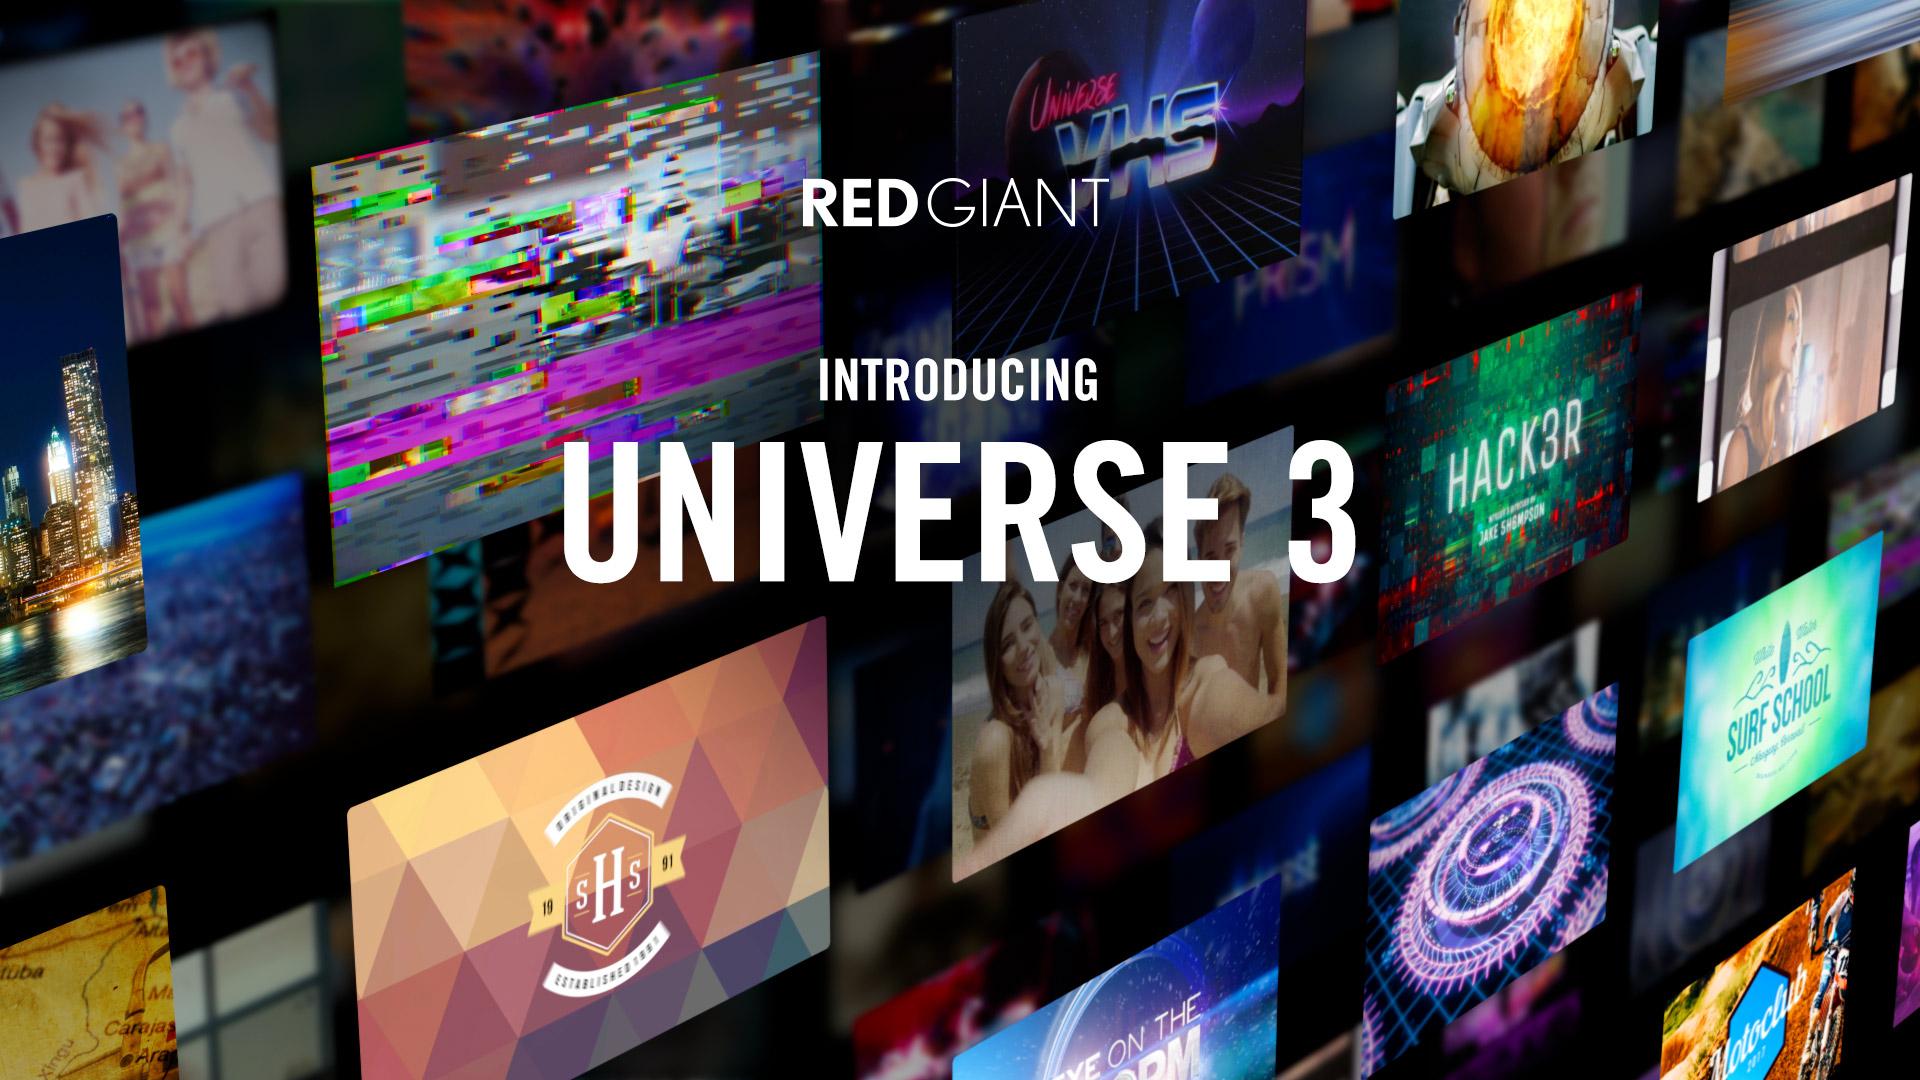 Red GiantがUniverse 3.0をリリース - NLEに組み込んで使えるテキストエフェクトソフトウエア